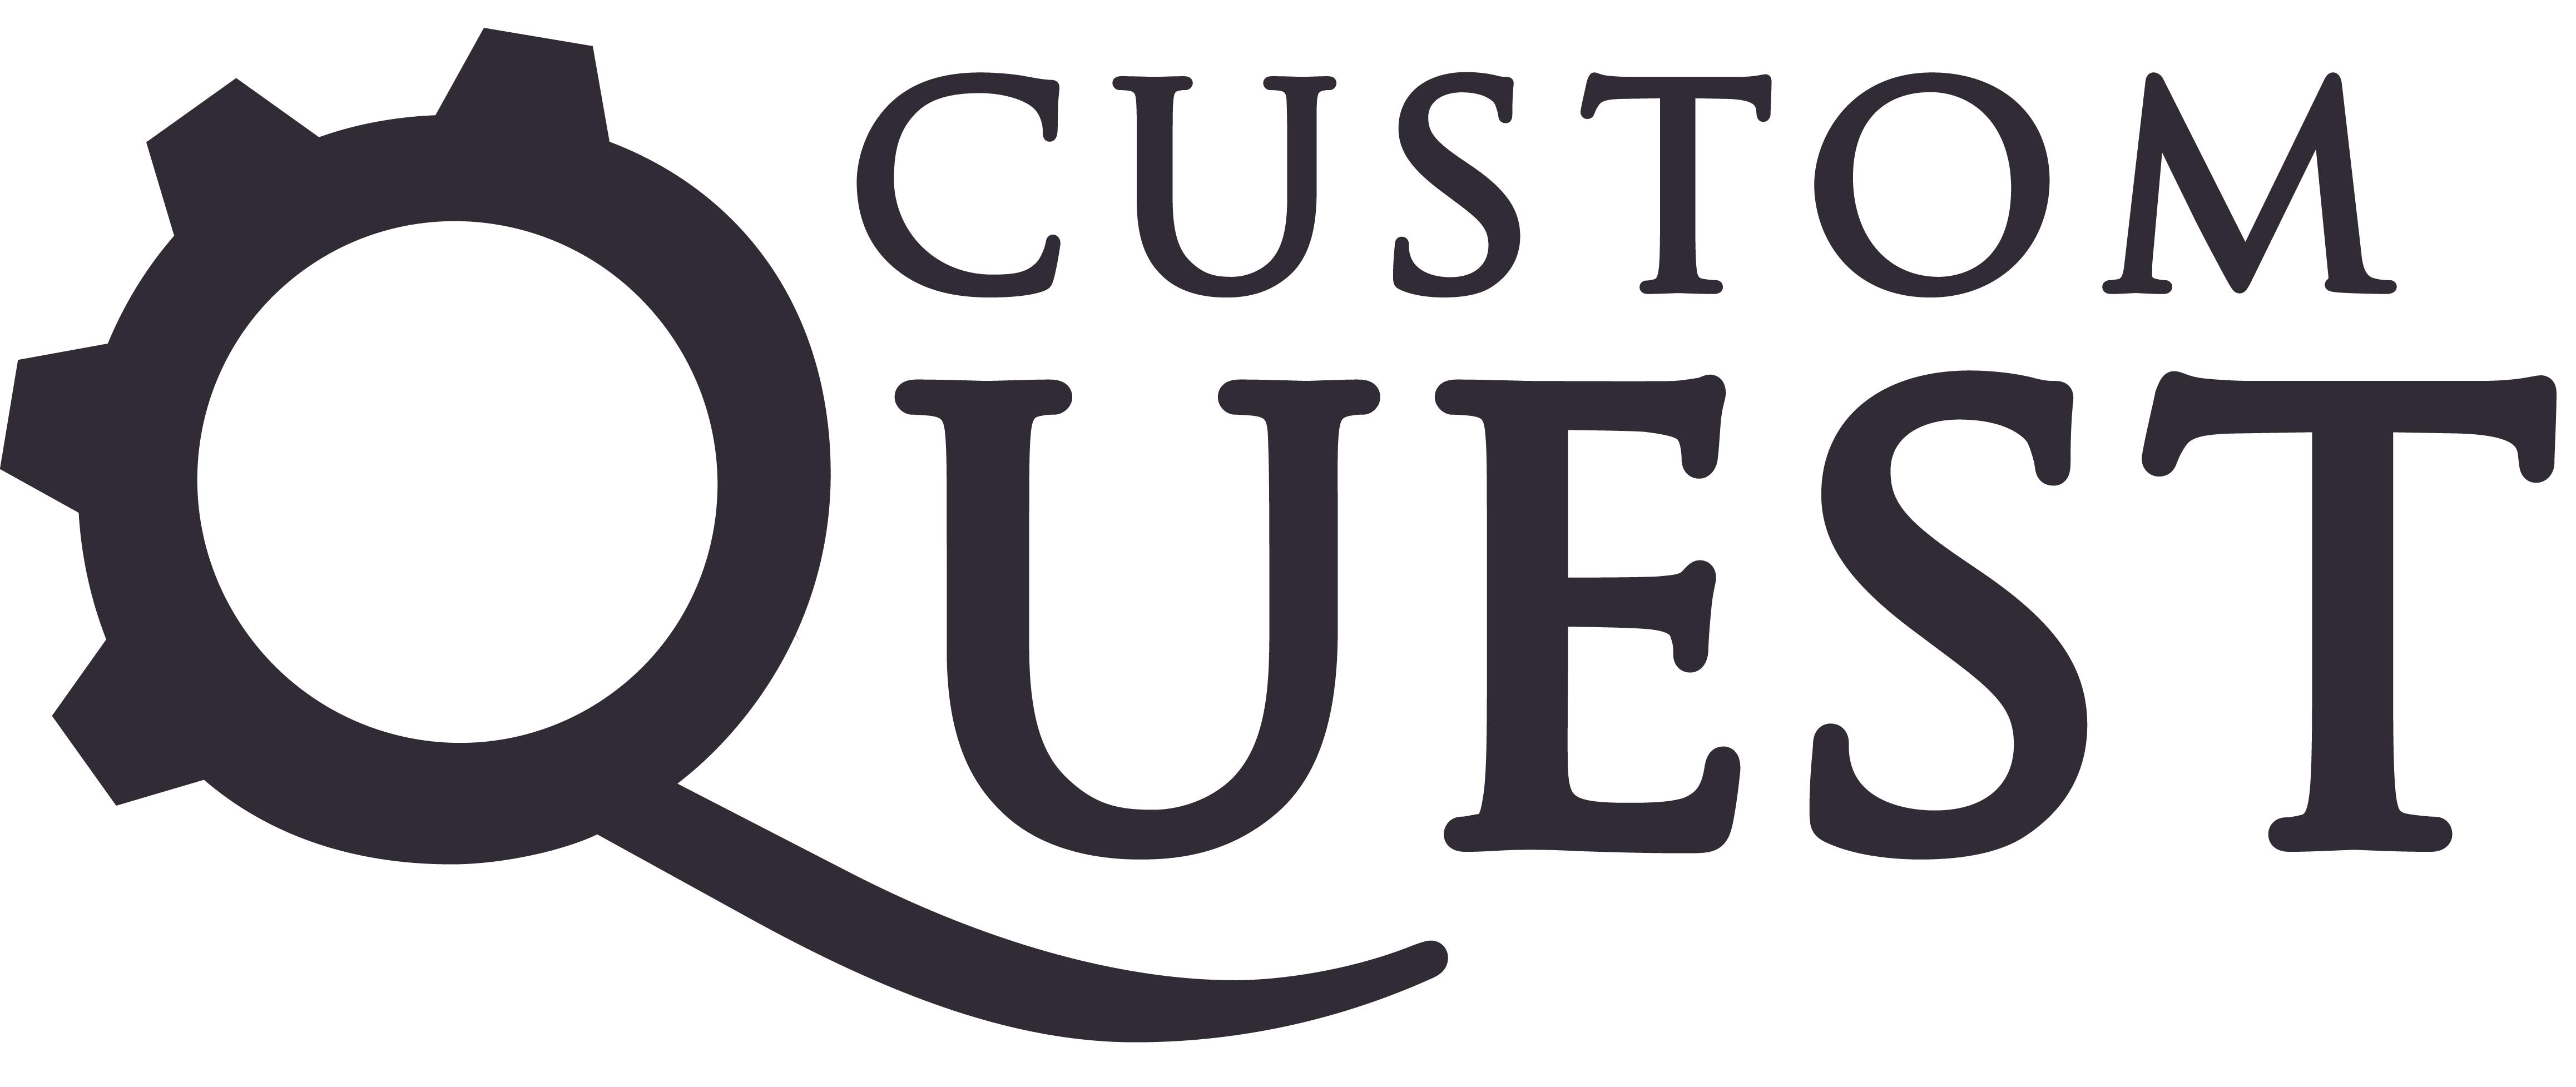 CustomQuest Logo